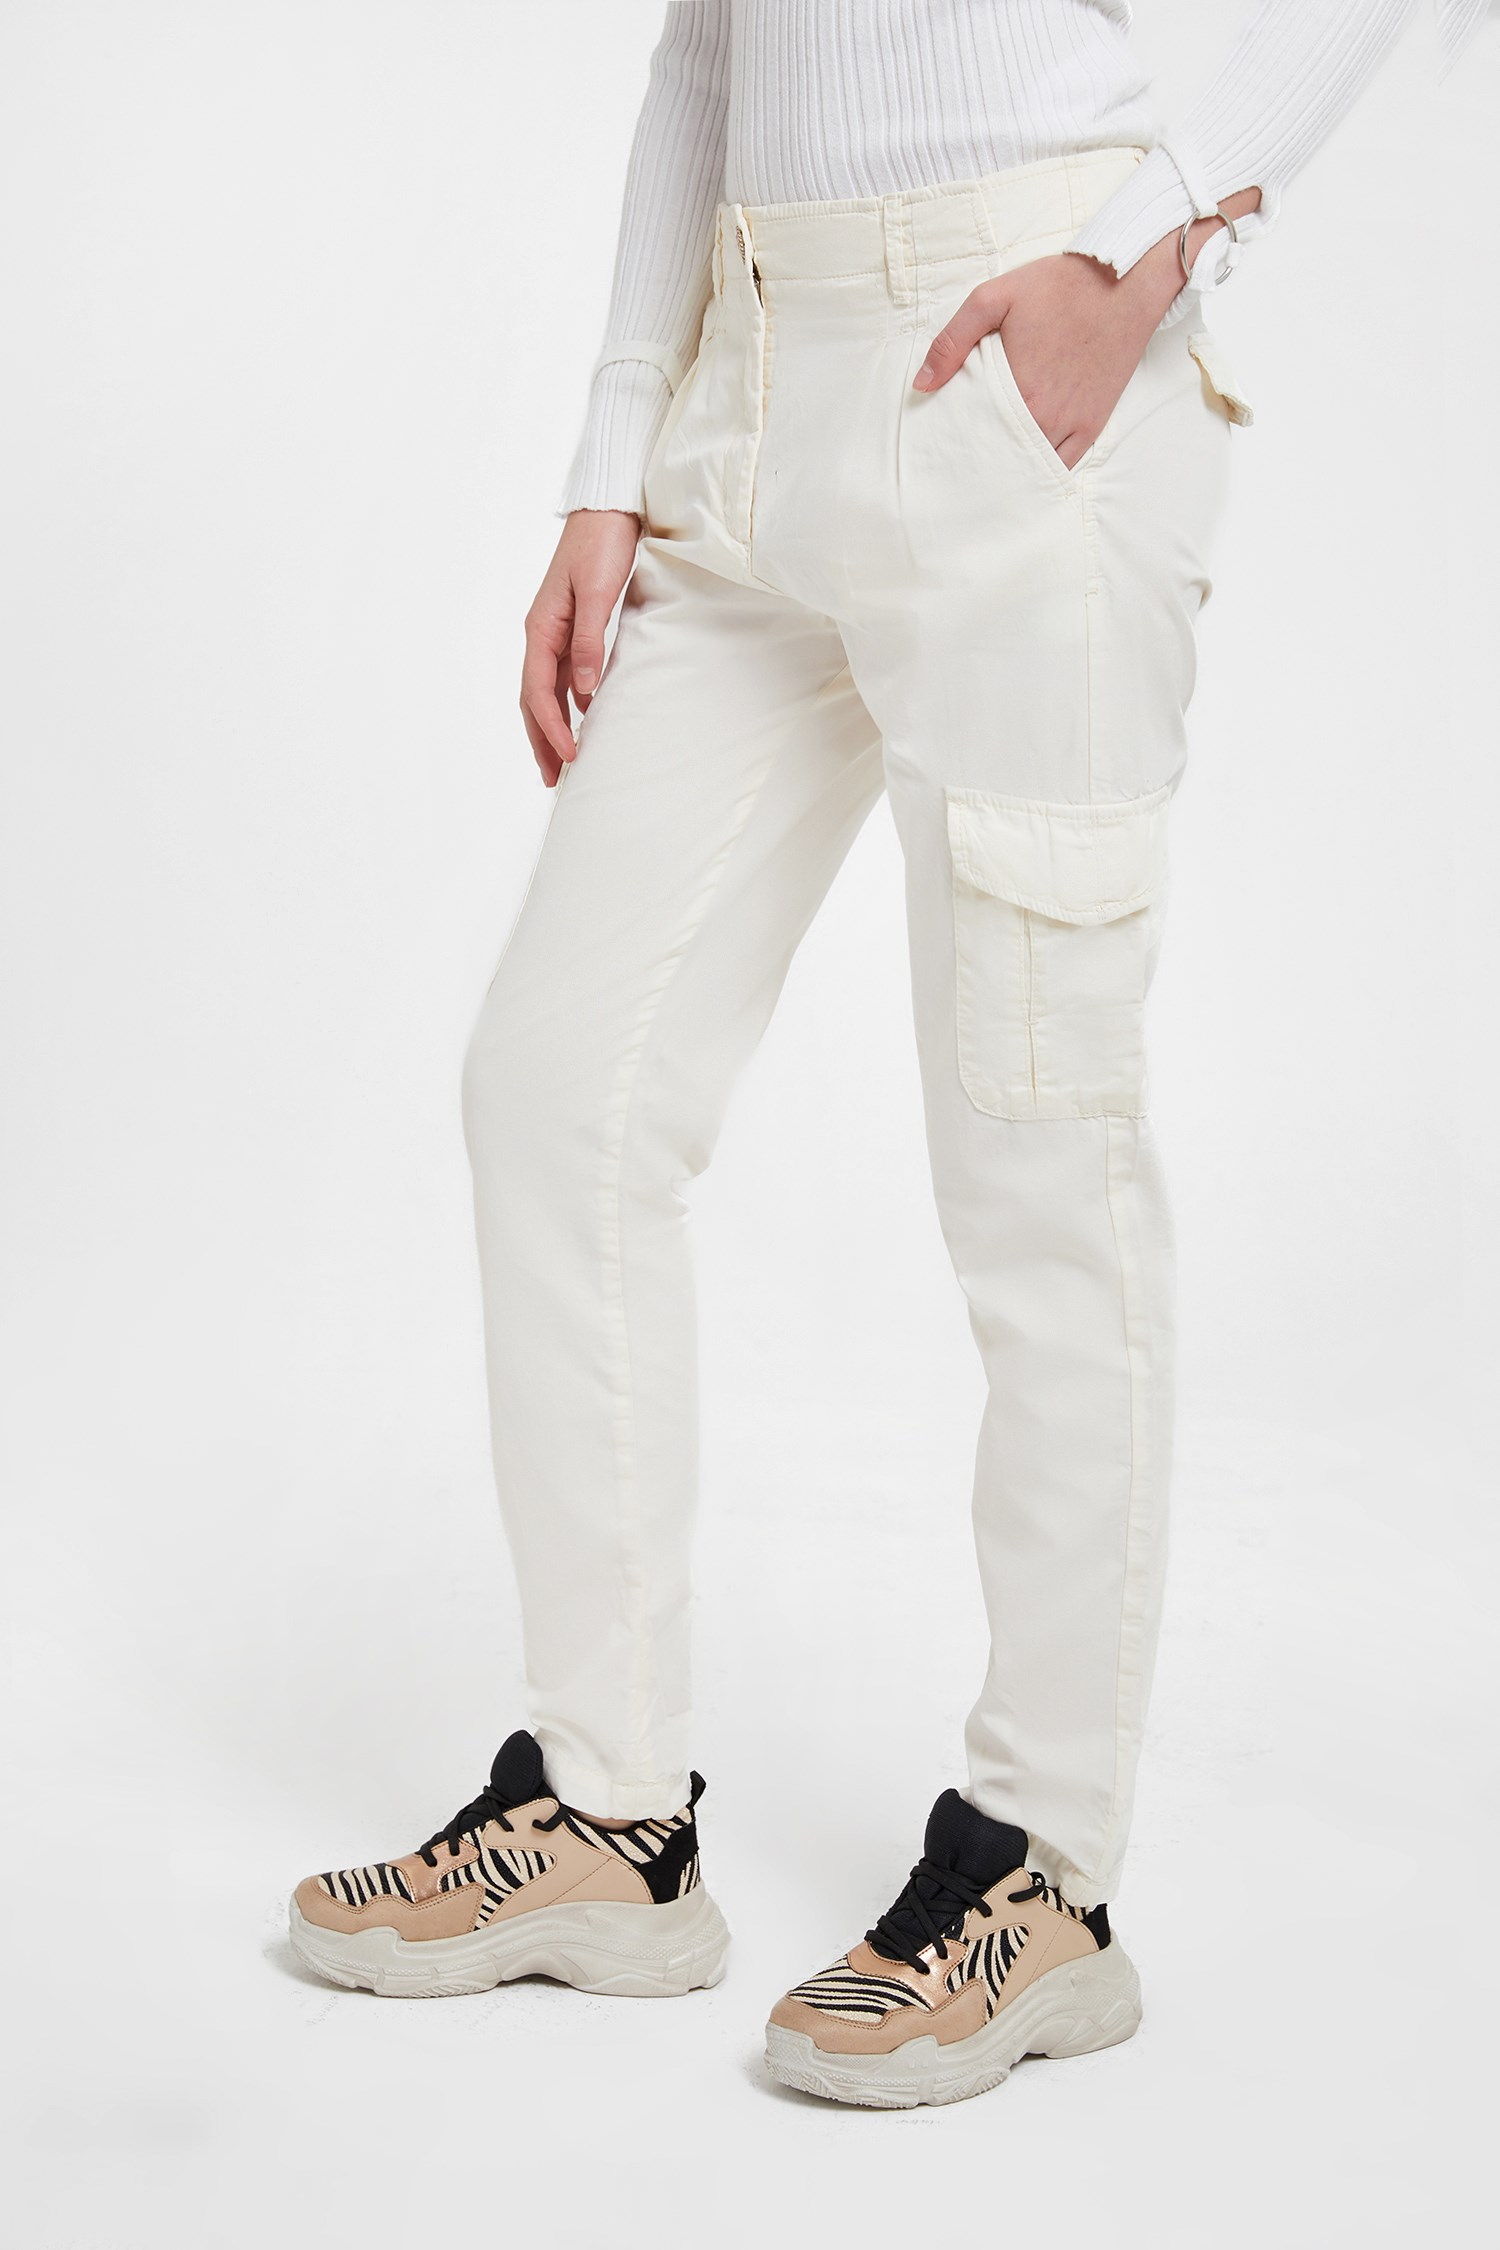 Bayan Kahverengi Düşük Bel Kargo Pantolon